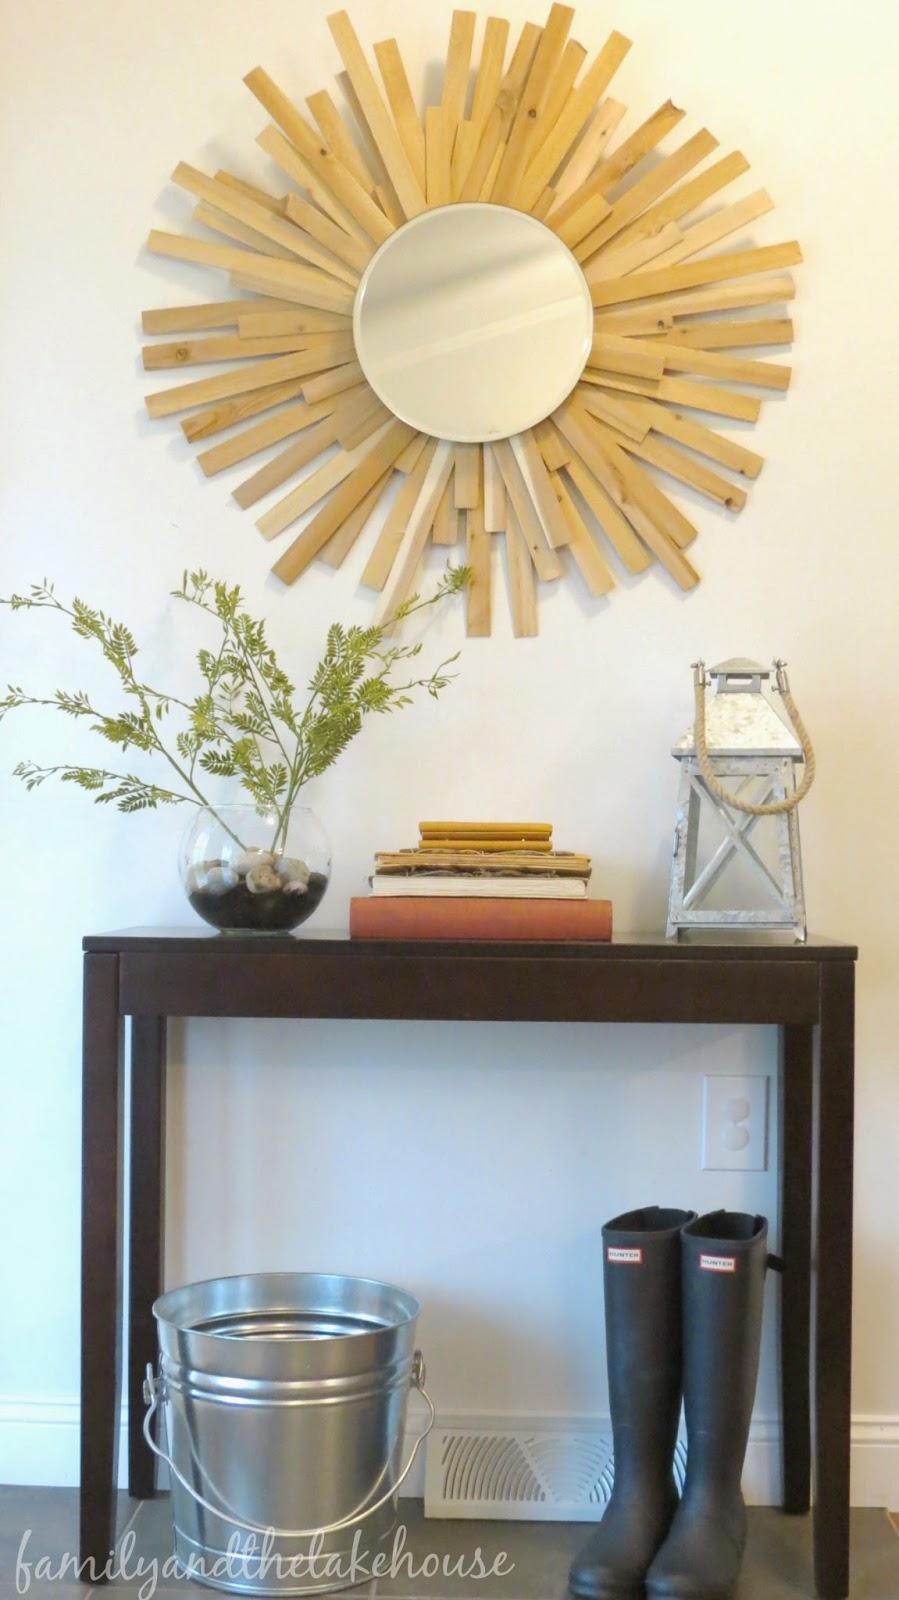 Family and the Lake House - Cedar Shim Sunburst Mirror